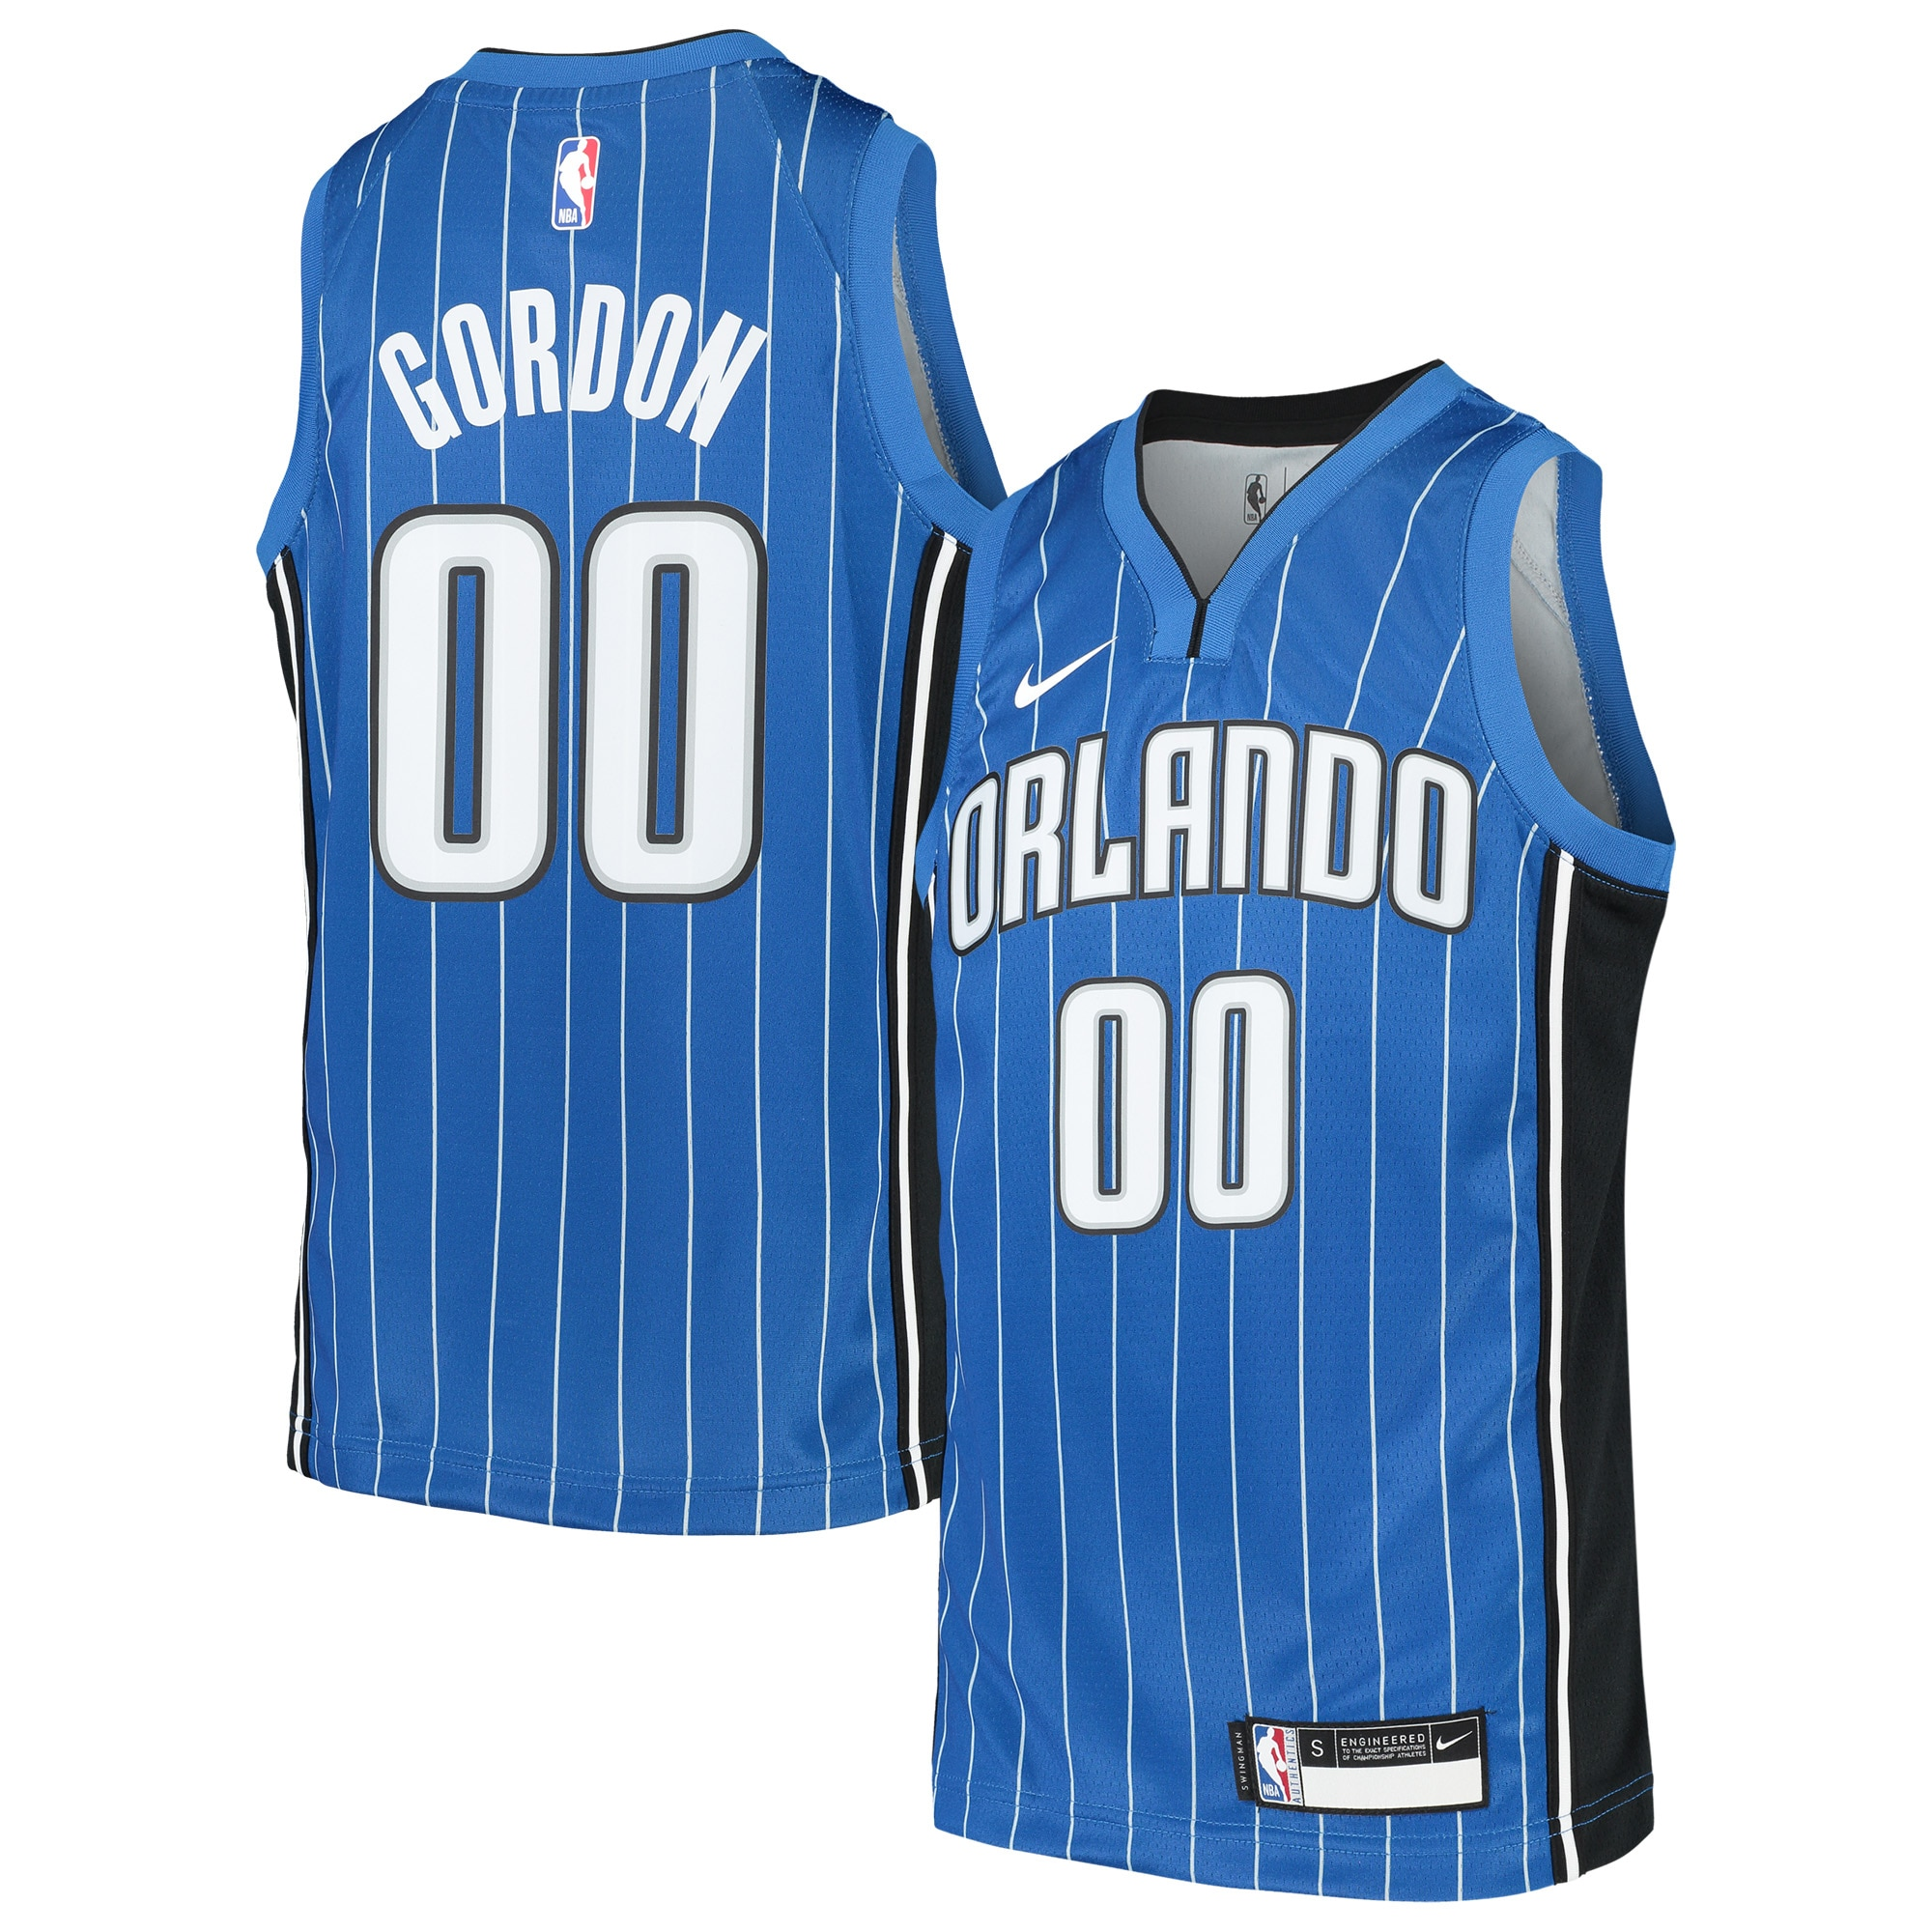 Aaron Gordon Orlando Magic Nike Youth Swingman Jersey - Blue